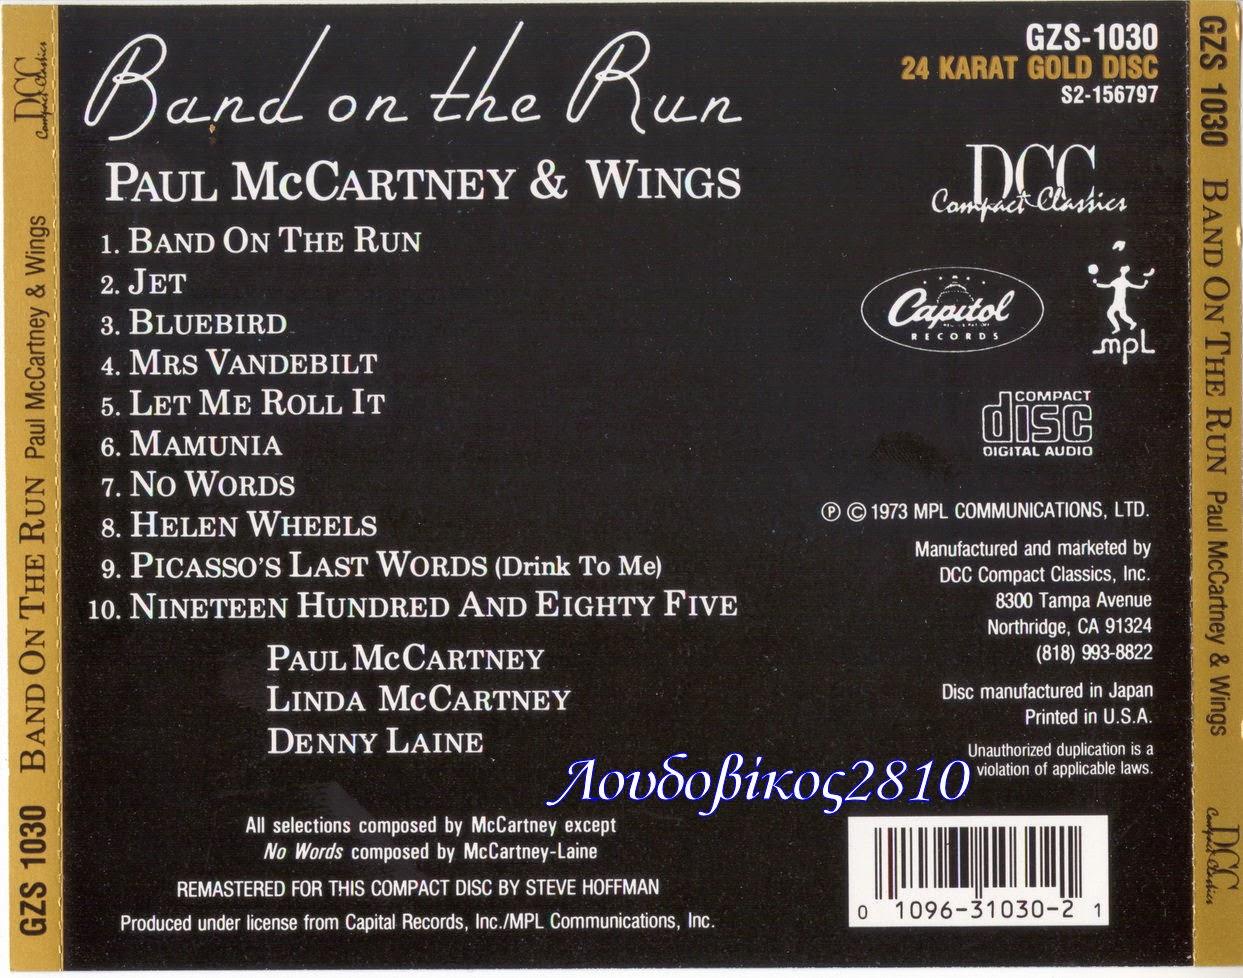 ENTRE MUSICA PAUL McCARTNEY WINGS